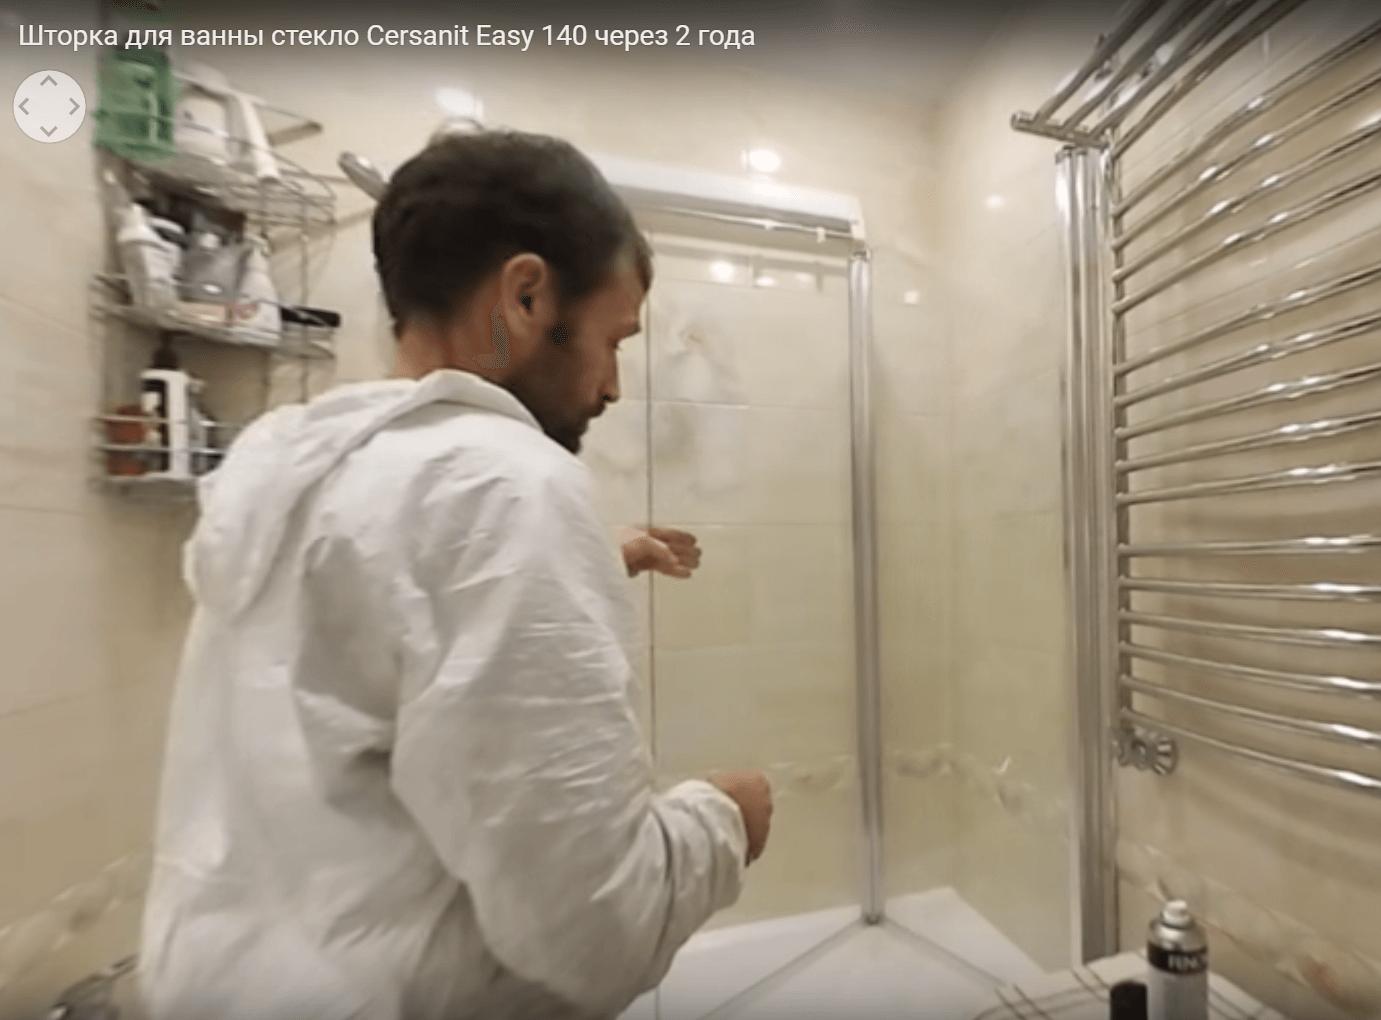 SHtorka_dlya_vanny_steklo_Cersanit_Easy Шторка для ванны стекло Cersanit Easy 140 через 2 года